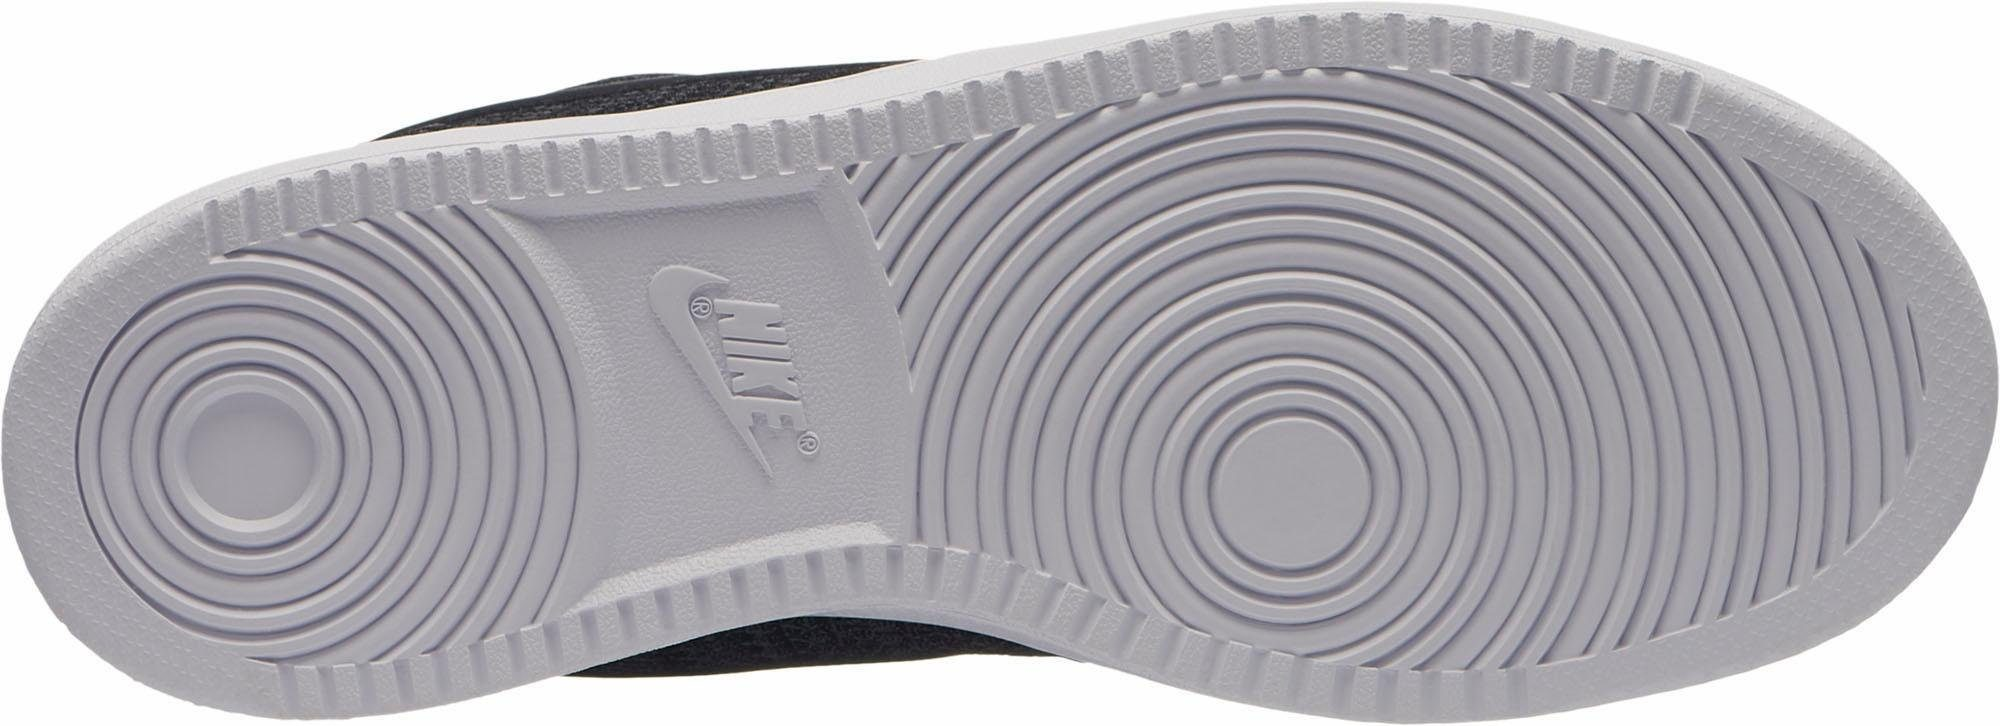 Nike Sportswear Ebernon Low Premium Sneaker  anthrazit